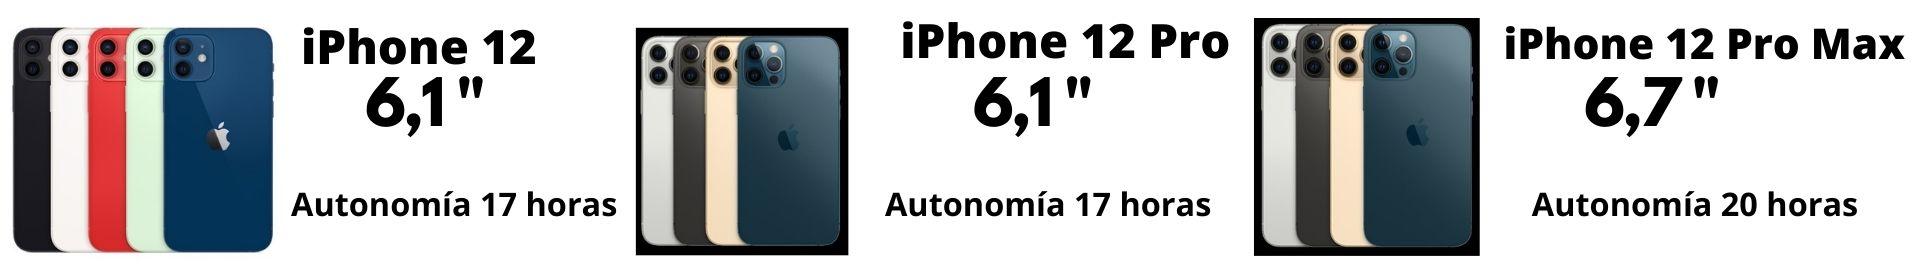 Baterías iPhone 12-12 Pro-12 Pro Max